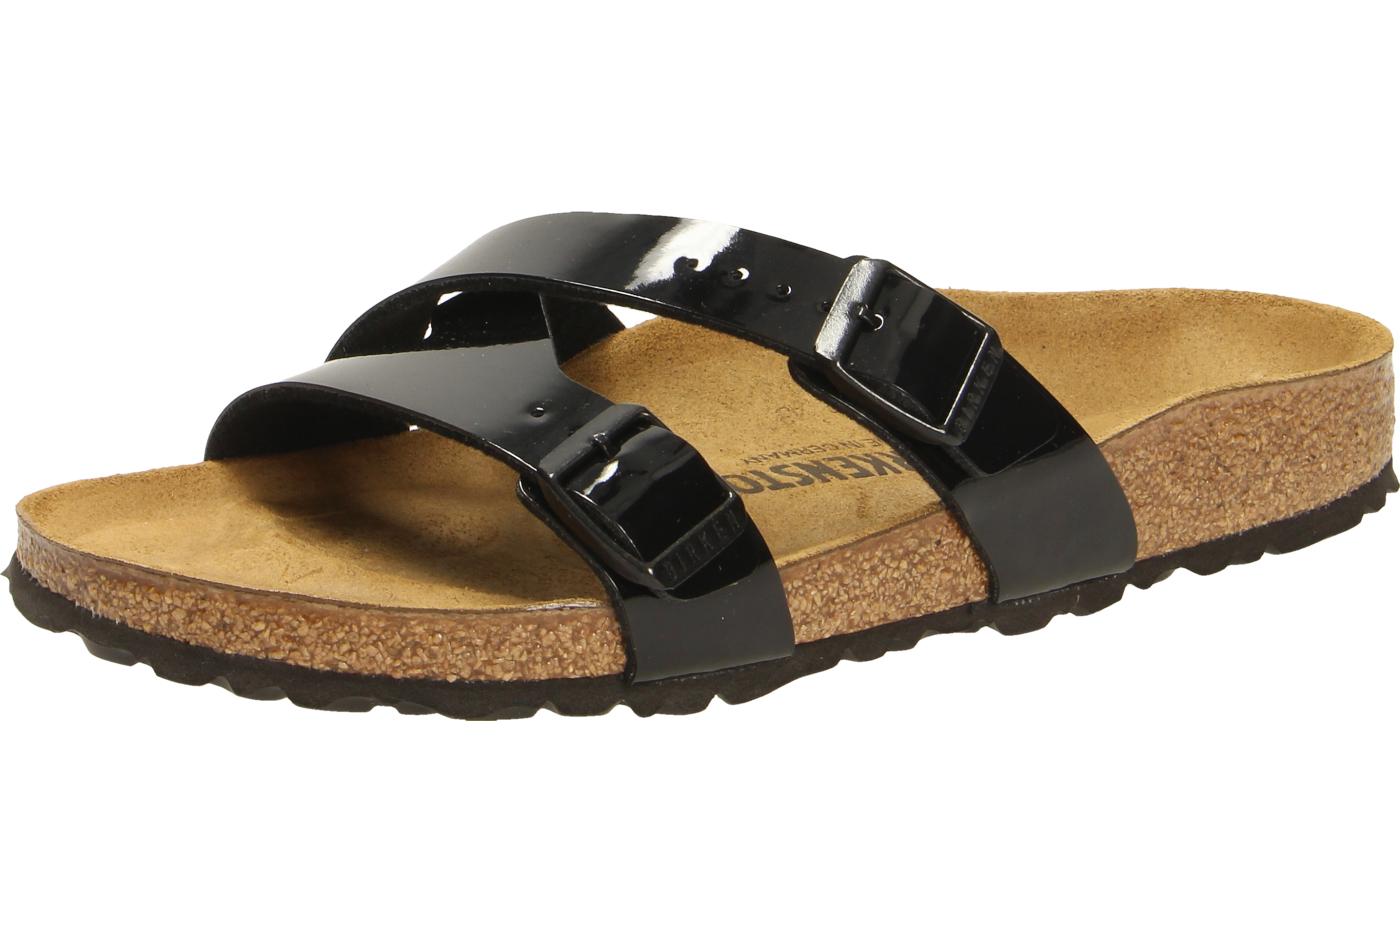 Birkenstock Yao Balance[Slipper] Pantolette Pantolette 1013272 38